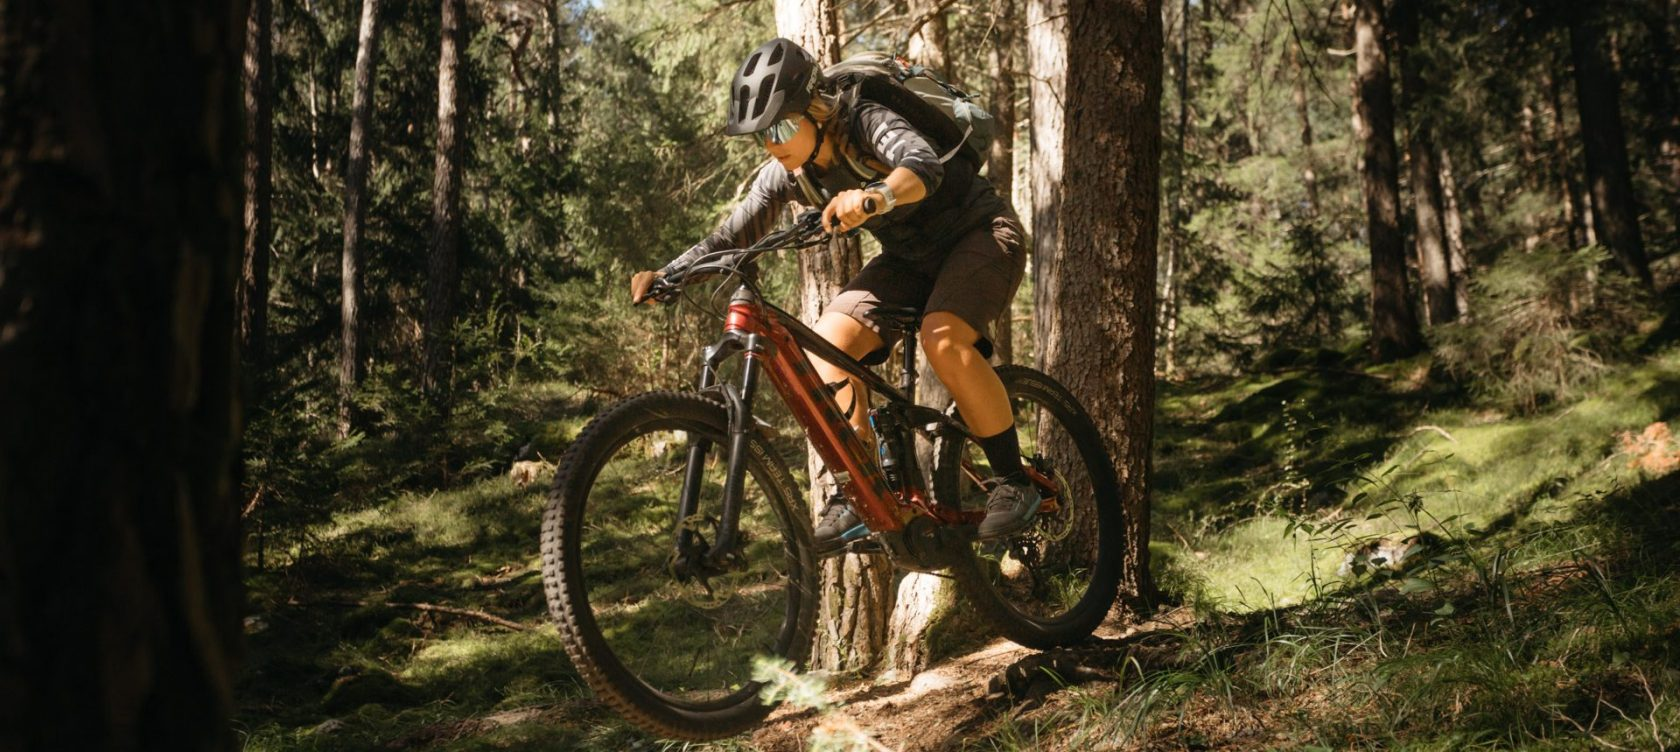 E-Bike Tour für Fortgeschrittene im Ötztal in Tirol